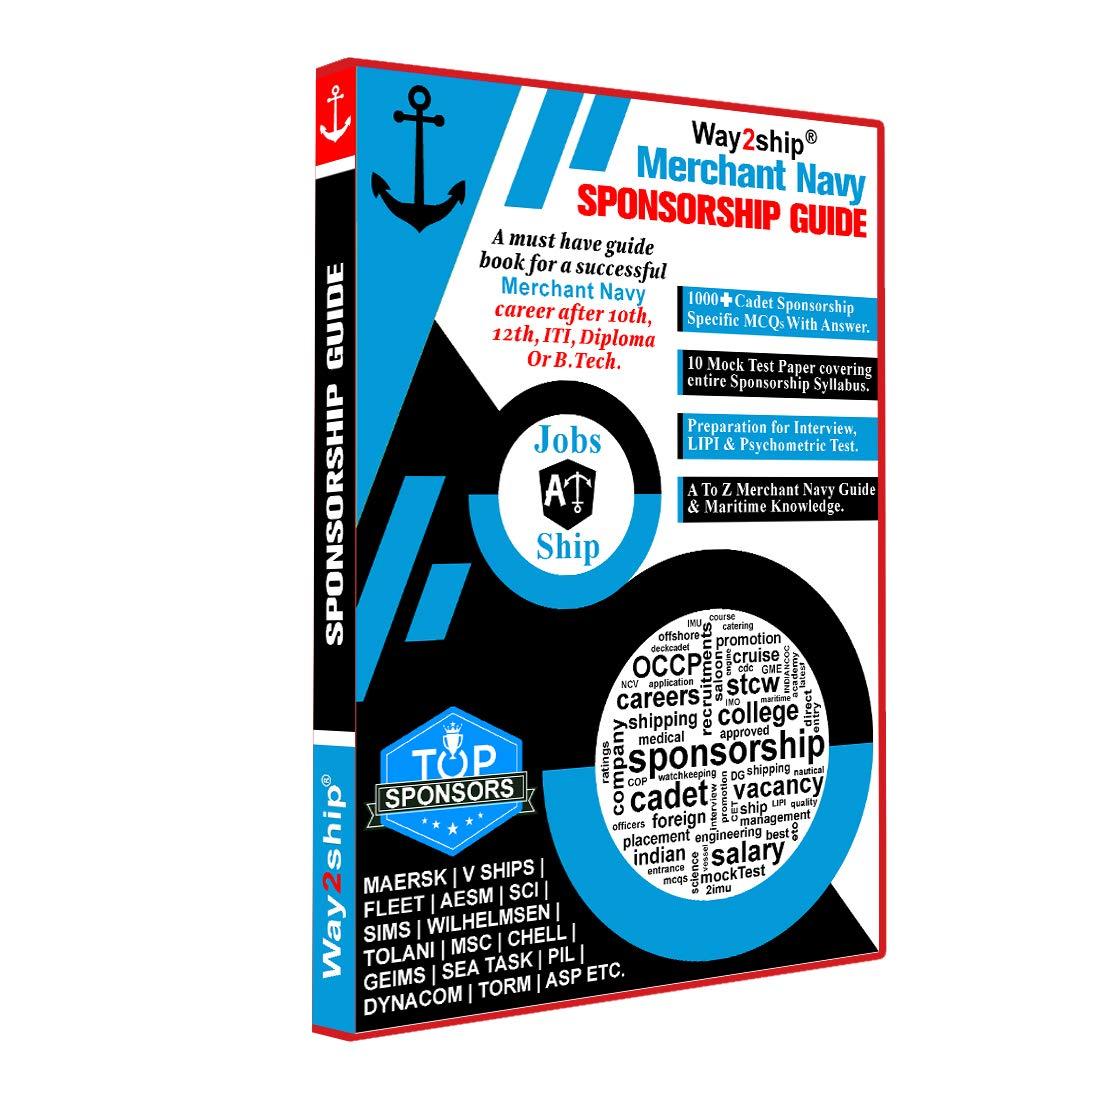 Join Merchant Navy – Sponsorship Guide | Way2ship